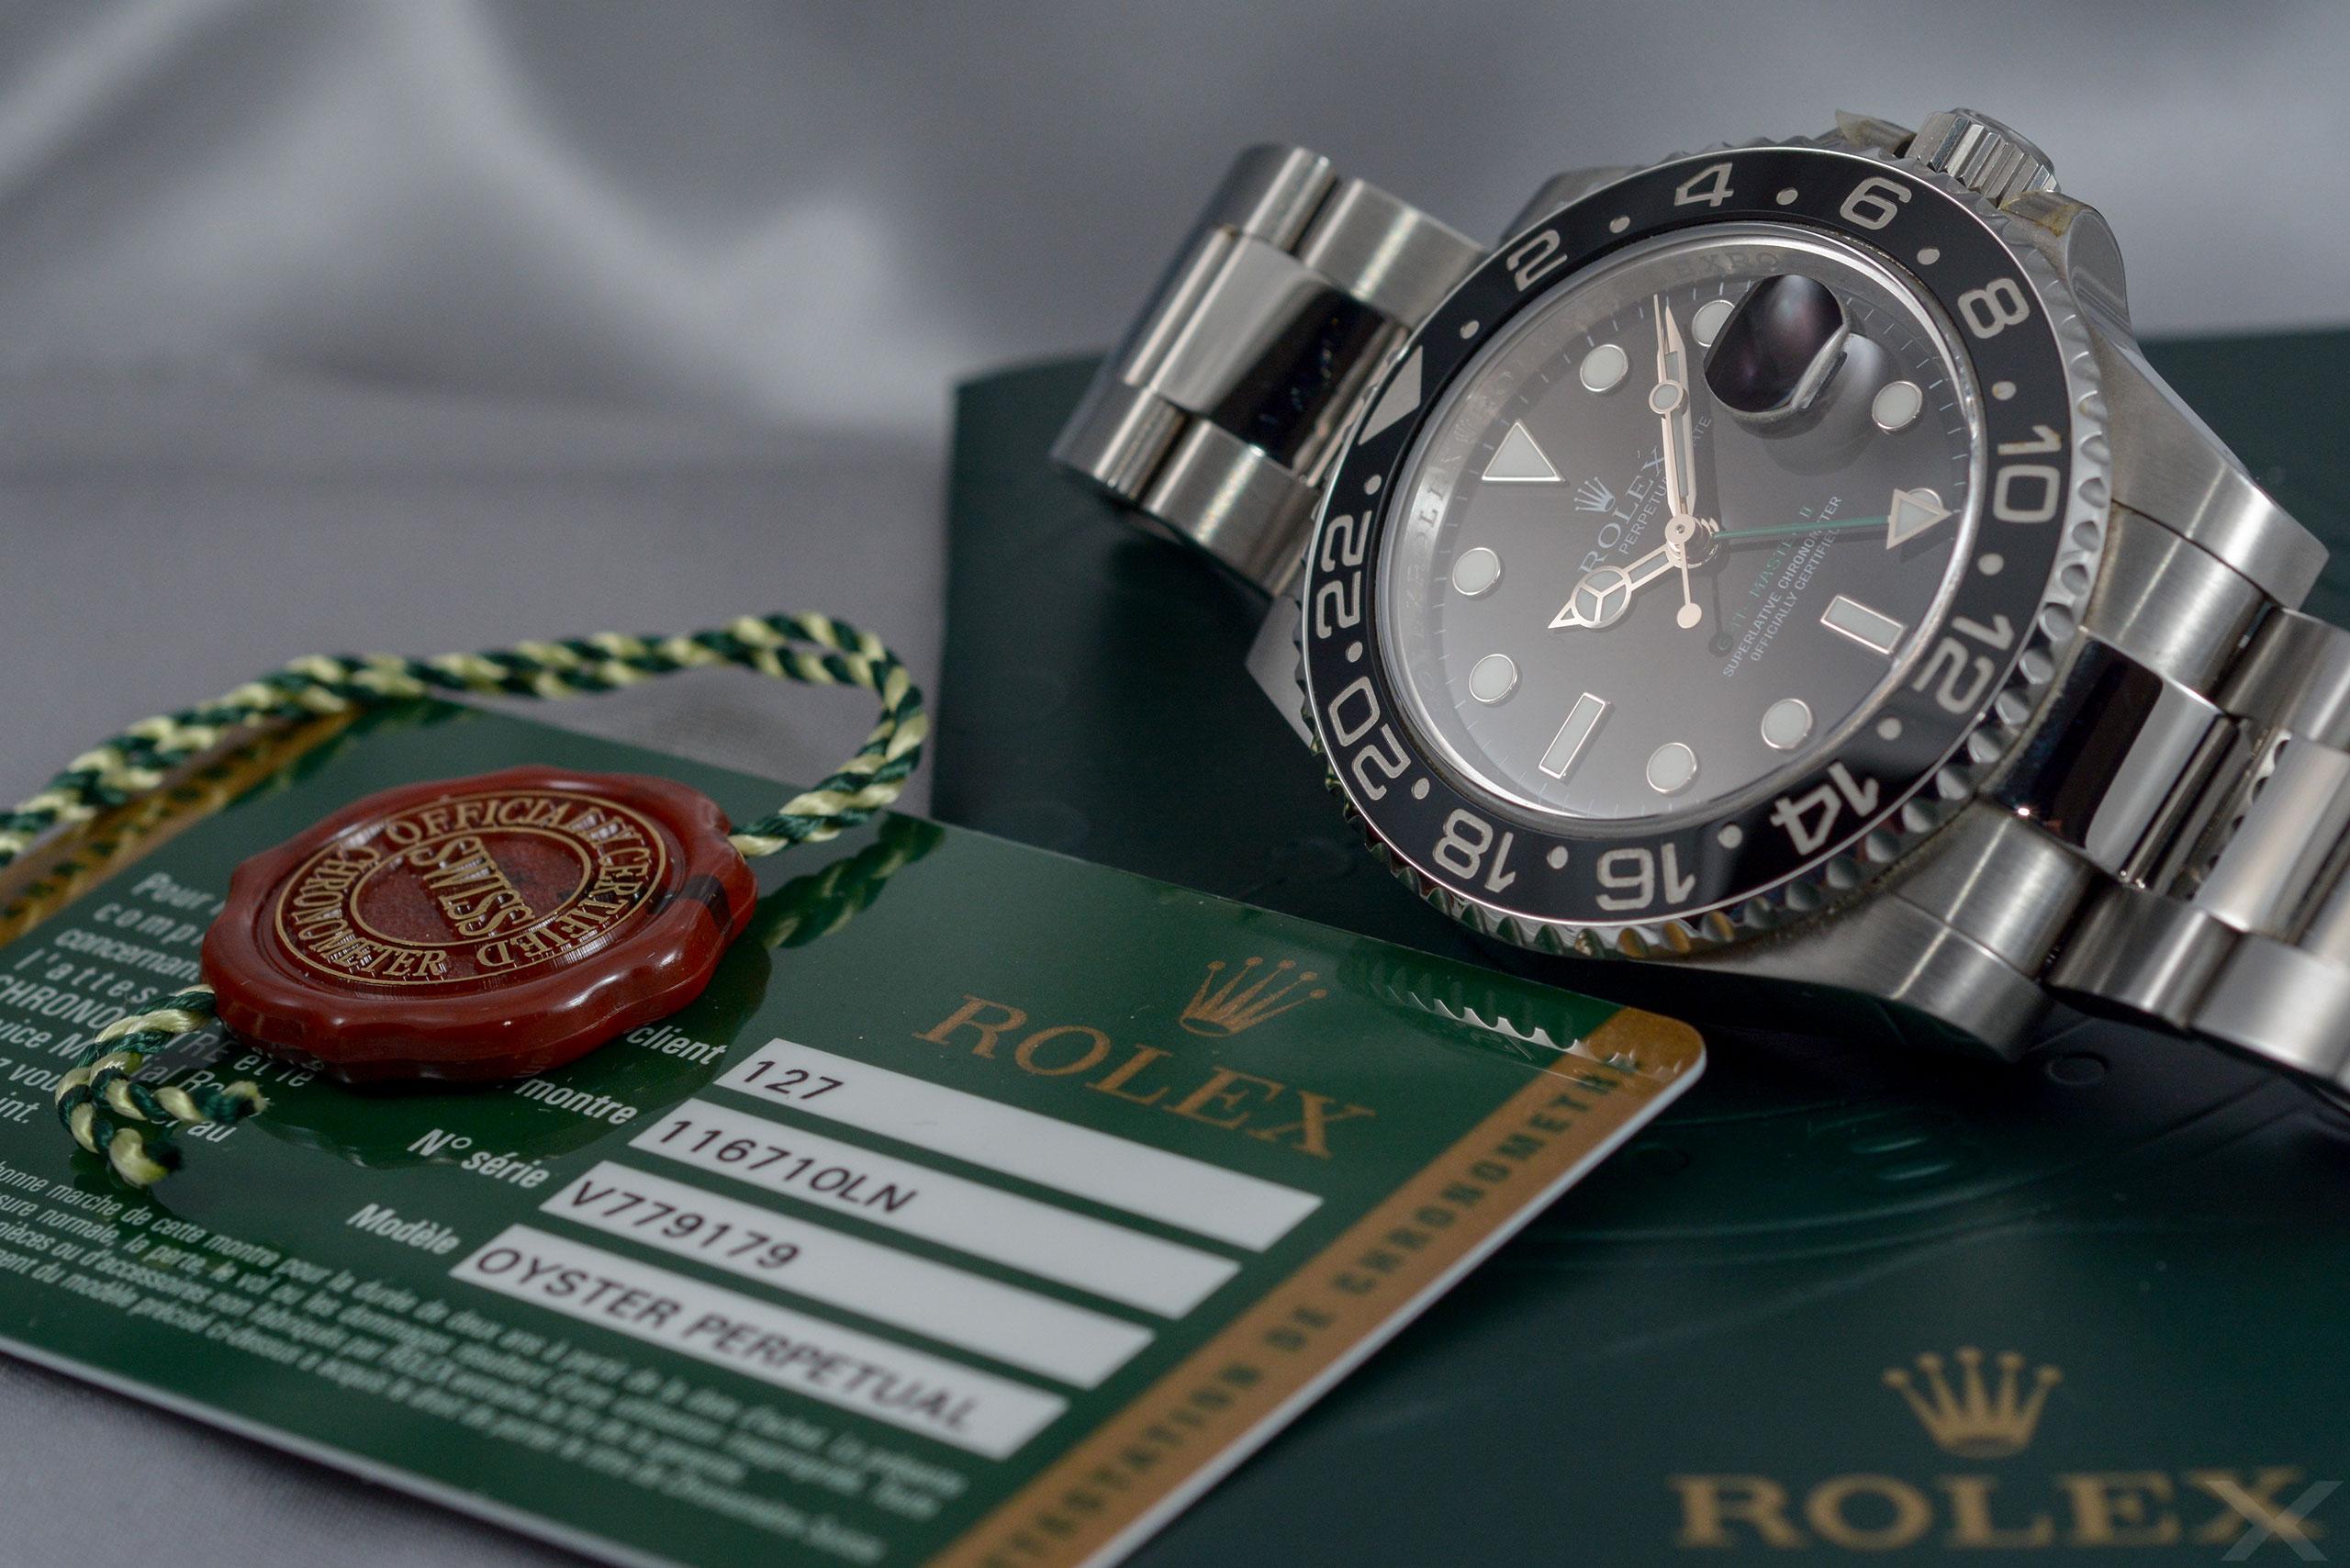 Rolex GMT-Master II, Ref. 116710LN Dr. Crott Luxify